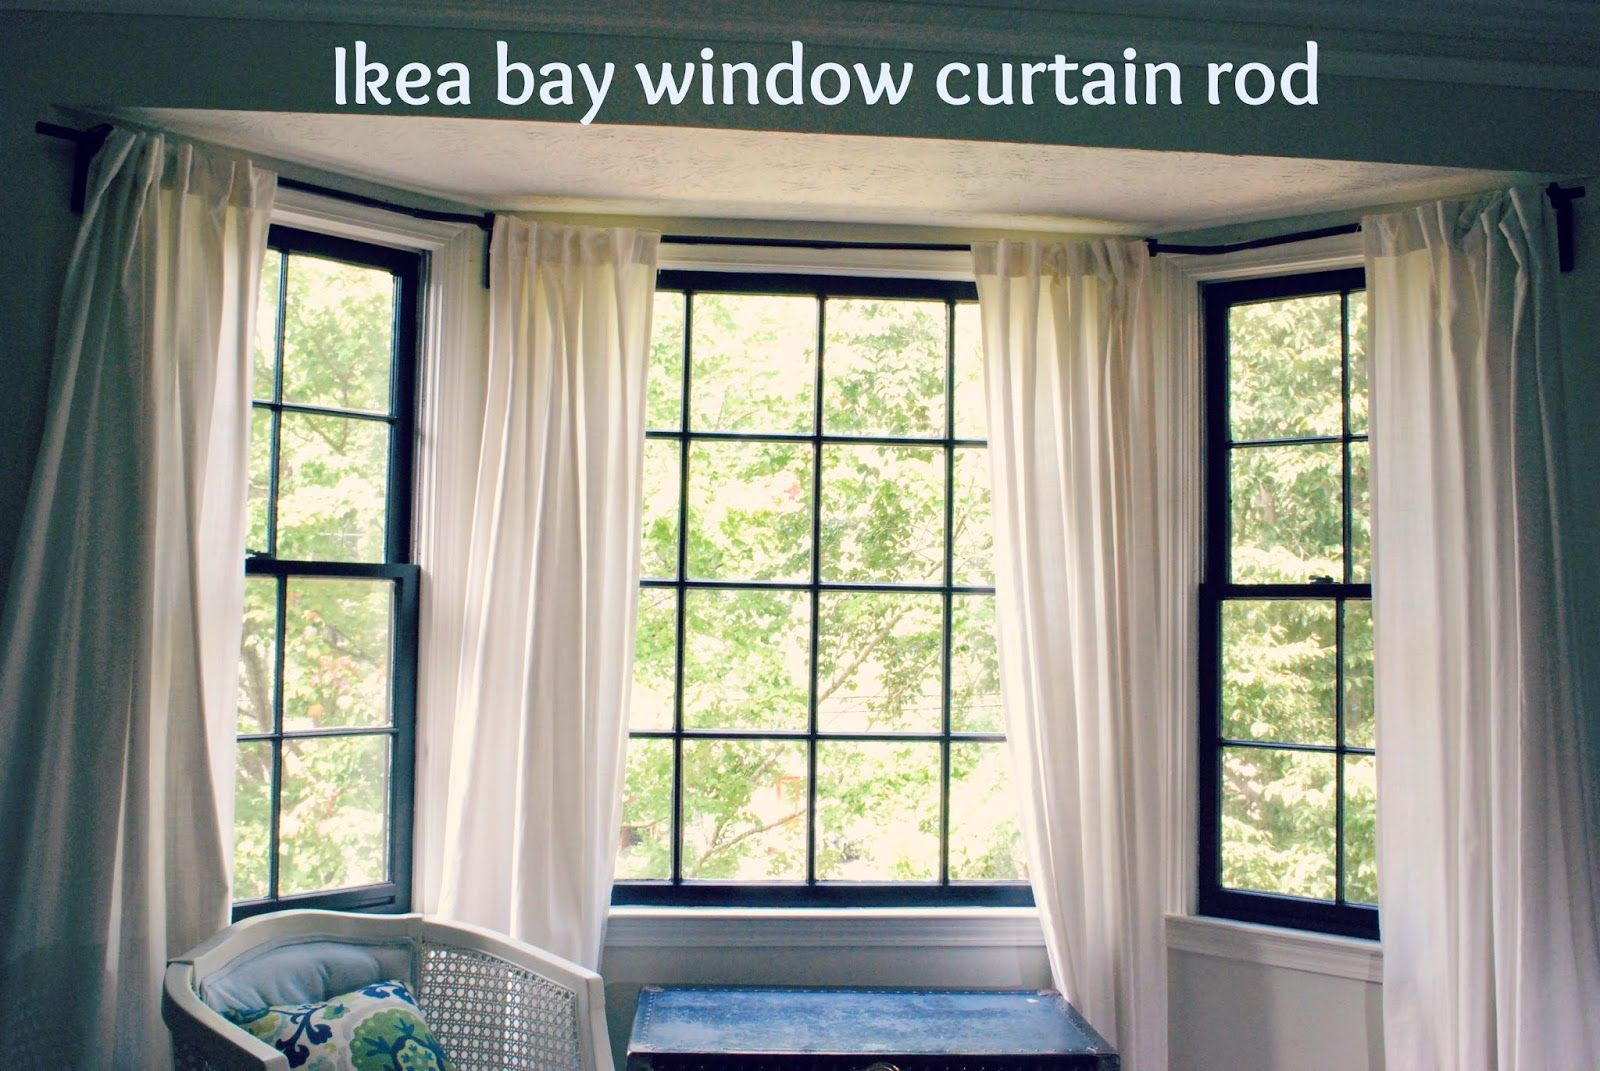 between blue and yellow ikea bay window curtain rod